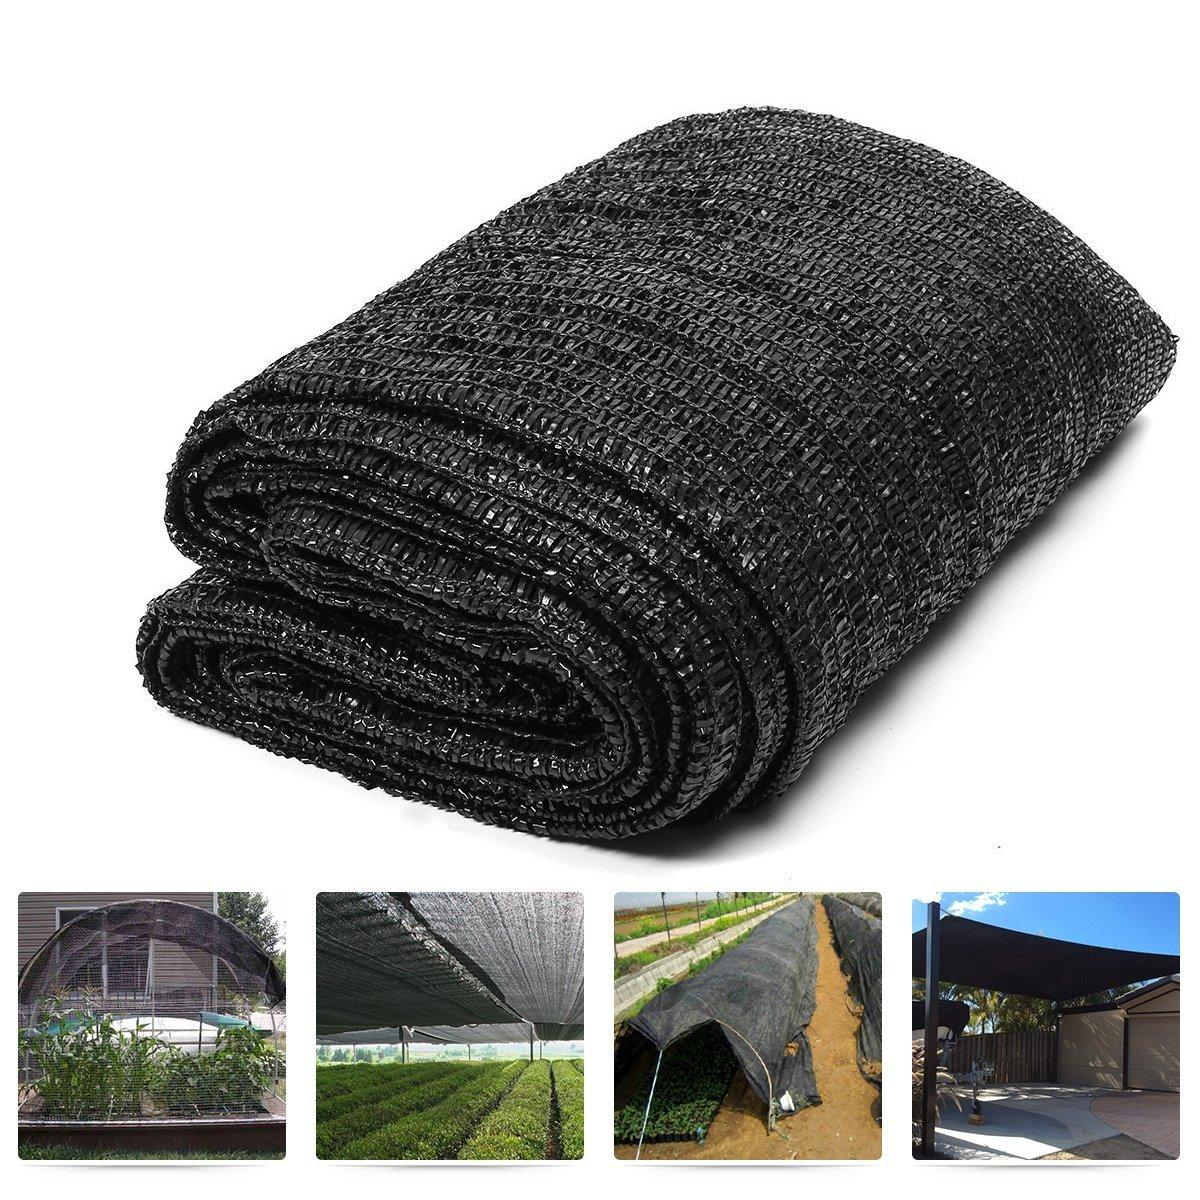 Originline Shade Cloth 6X12ft Black 70% UV Resistant Outdoor Sun Screens for Plants/Pergola/Patio/Lawn/Garden/Greenhouse/Carport/Porch Cut Edge